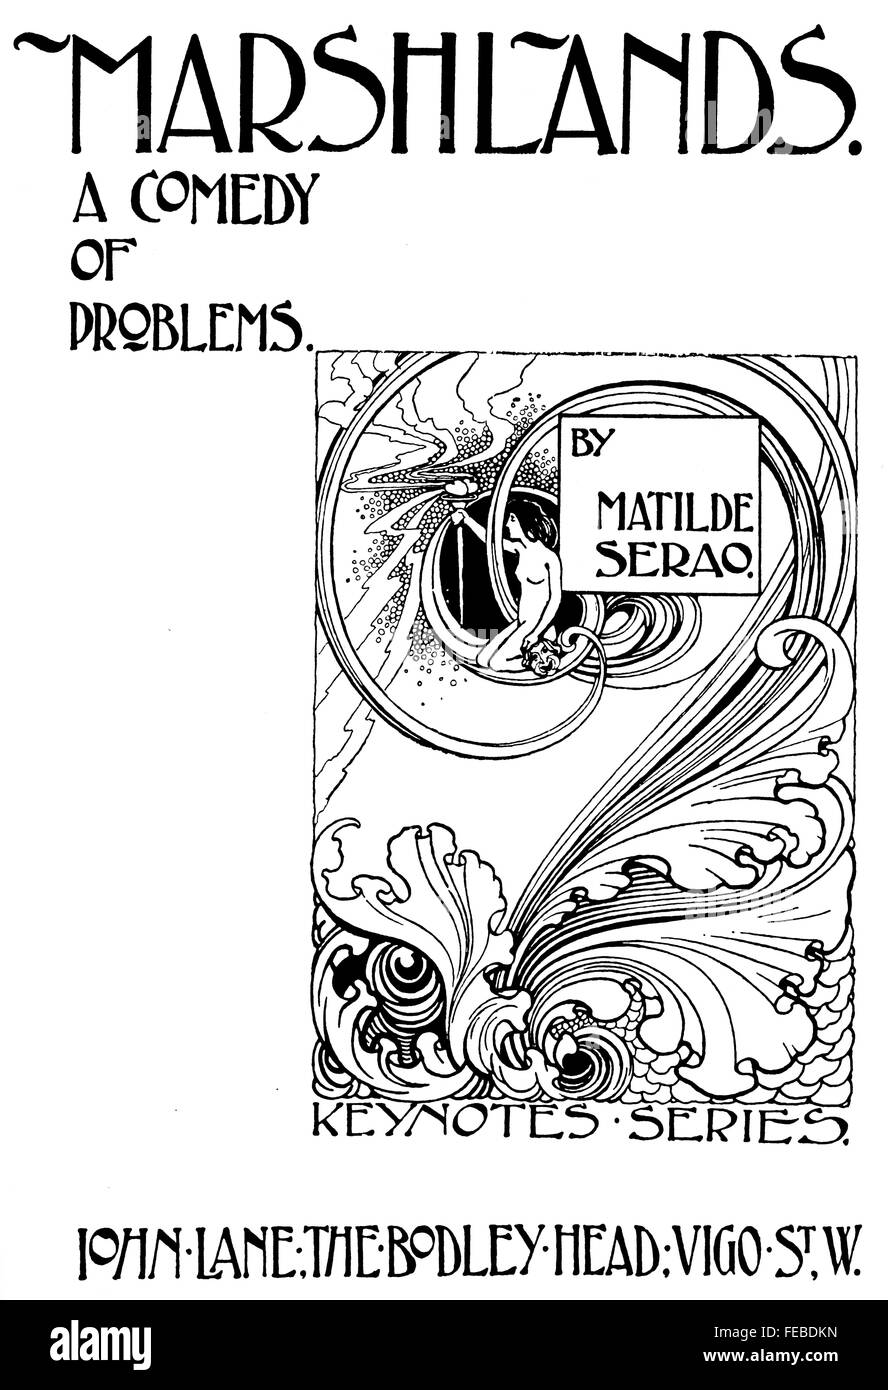 marshlands a comedy of problems book title page design by marshlands a comedy of problems book title page design by george m ellwood of london art nouveau line illustration 1897